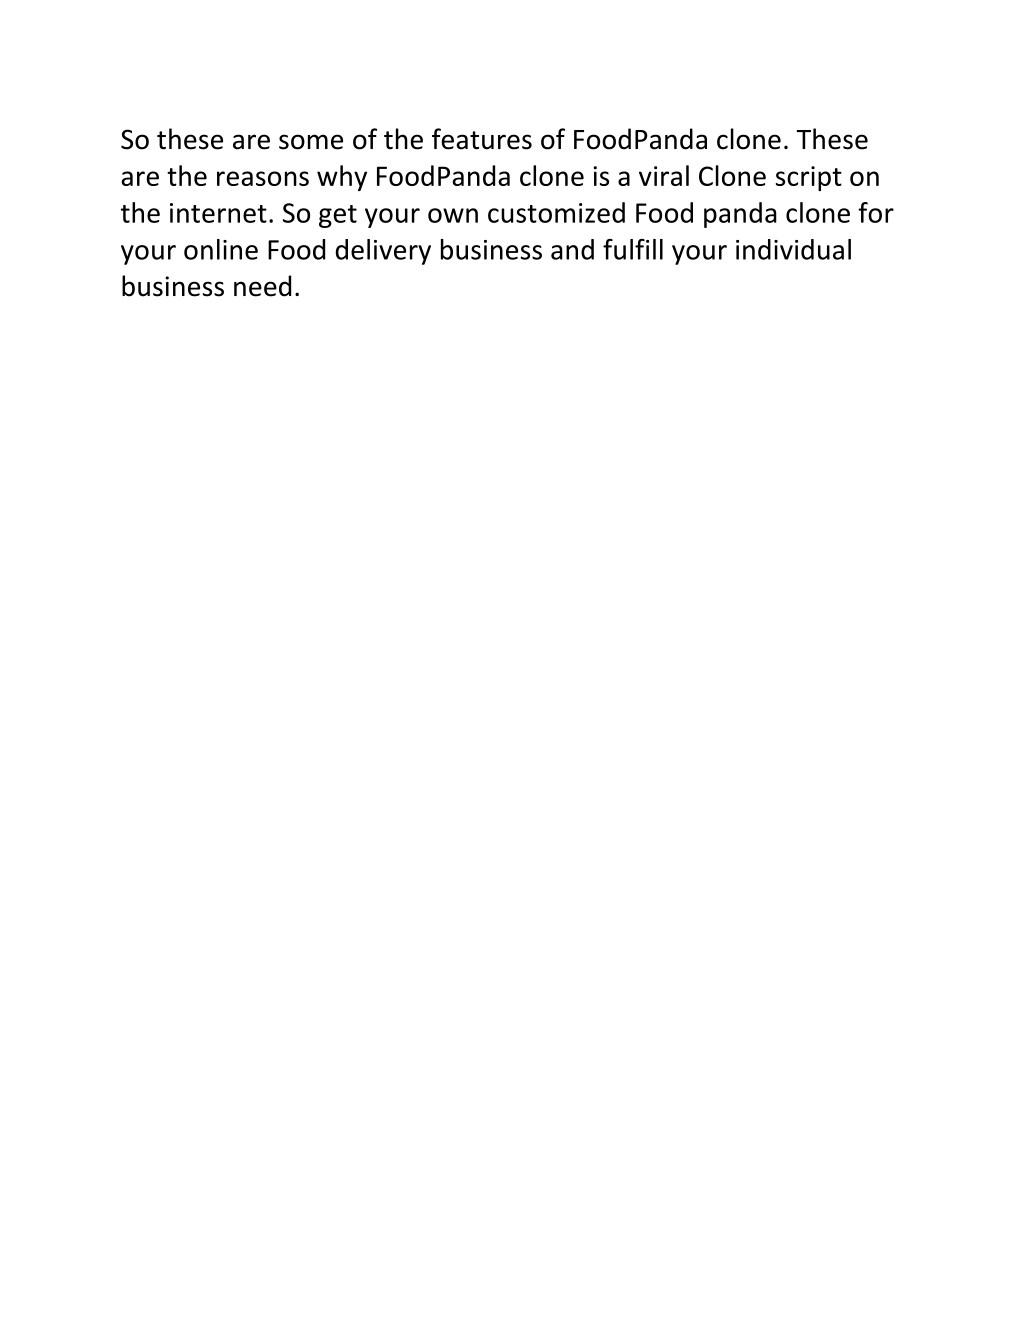 PPT - Foodpanda clone PowerPoint Presentation - ID:7728626